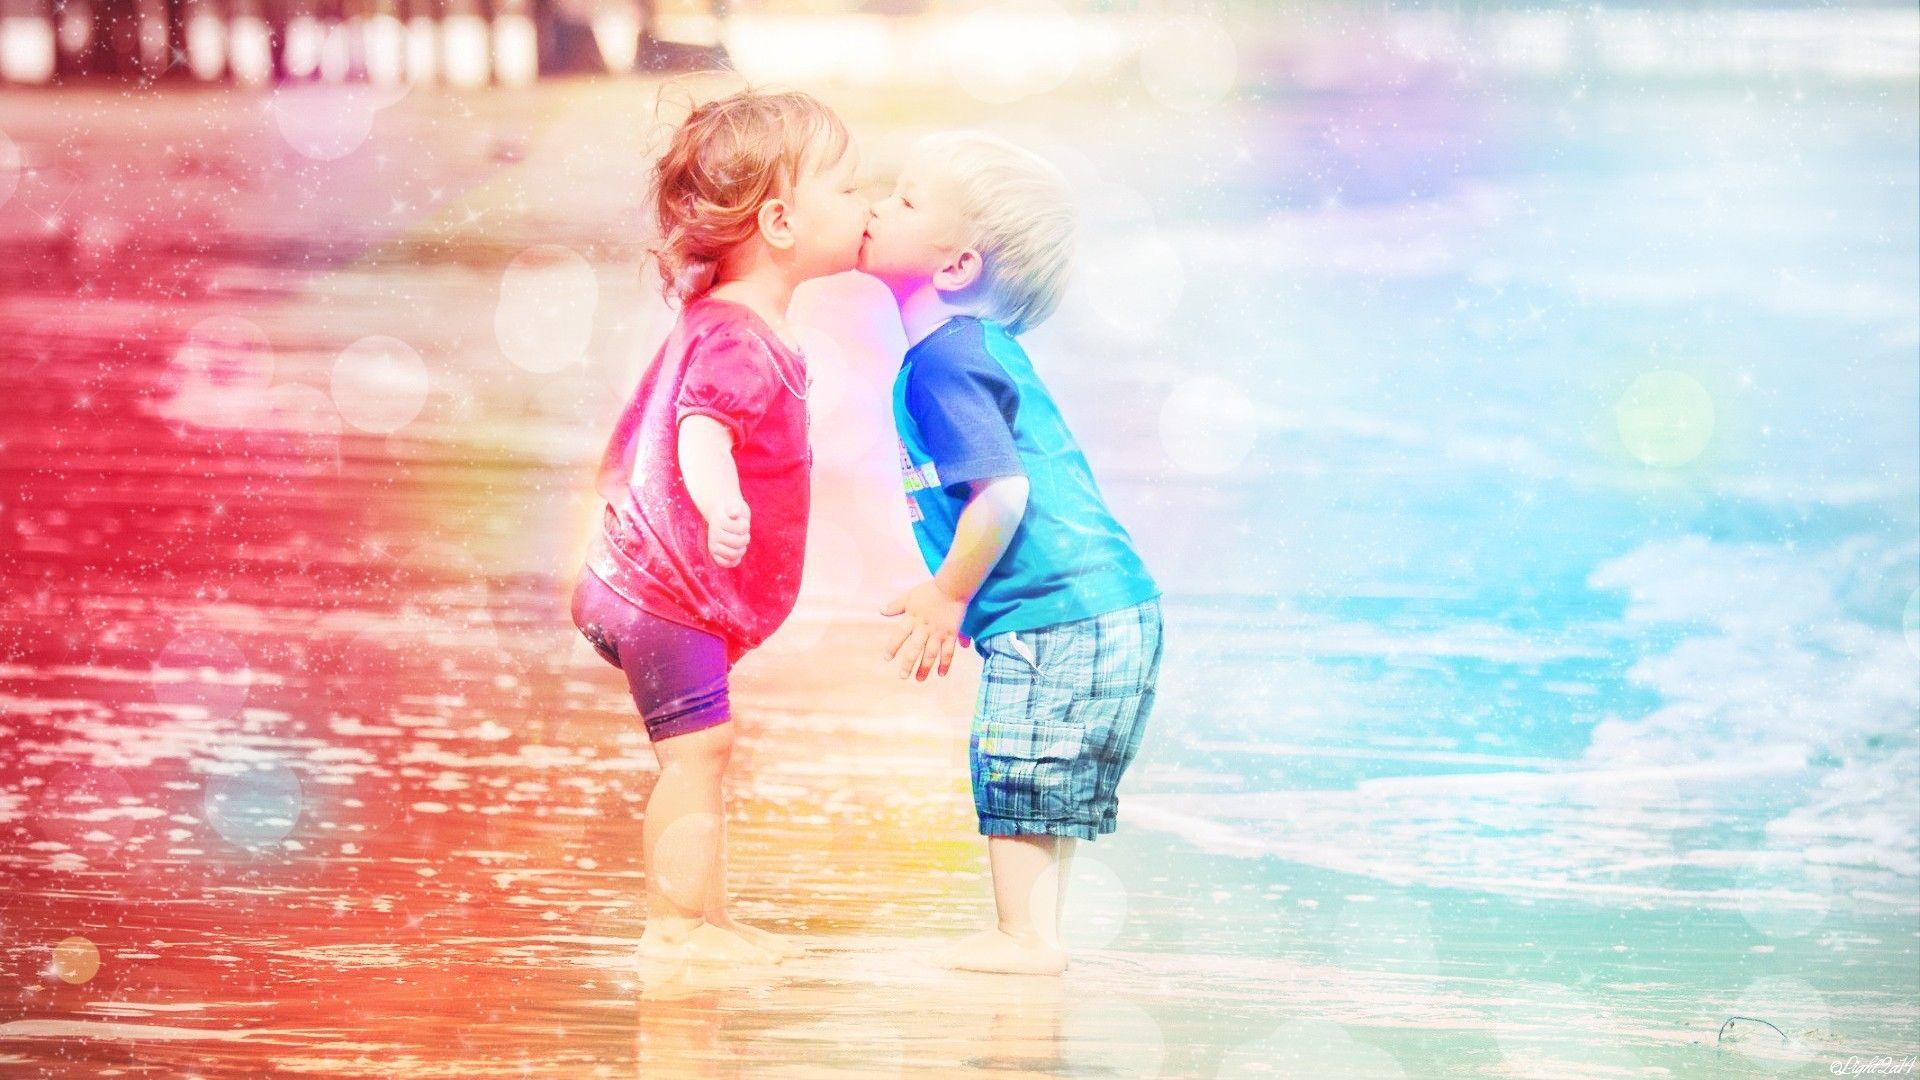 Hd wallpaper kiss - Beutifull Cute Hd Wallpapers Baby Kiss Desktop Dounlod Full Hd 1920 1200 Baby Kiss Images